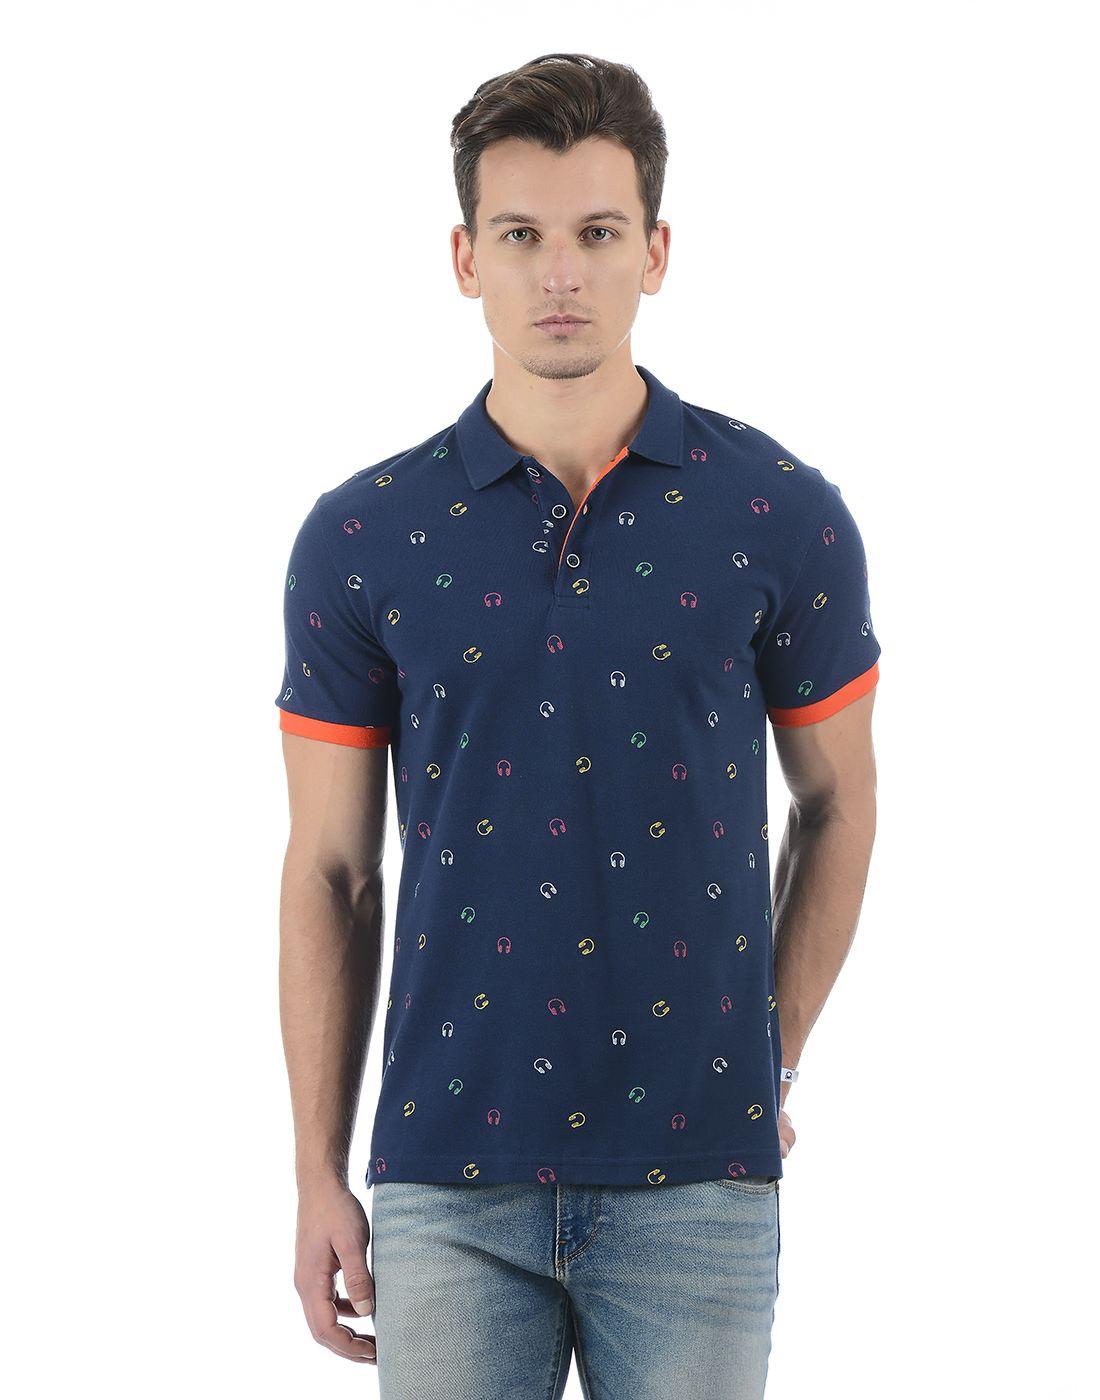 United Colors of Benetton Men's Blue Polo Neck T-shirt